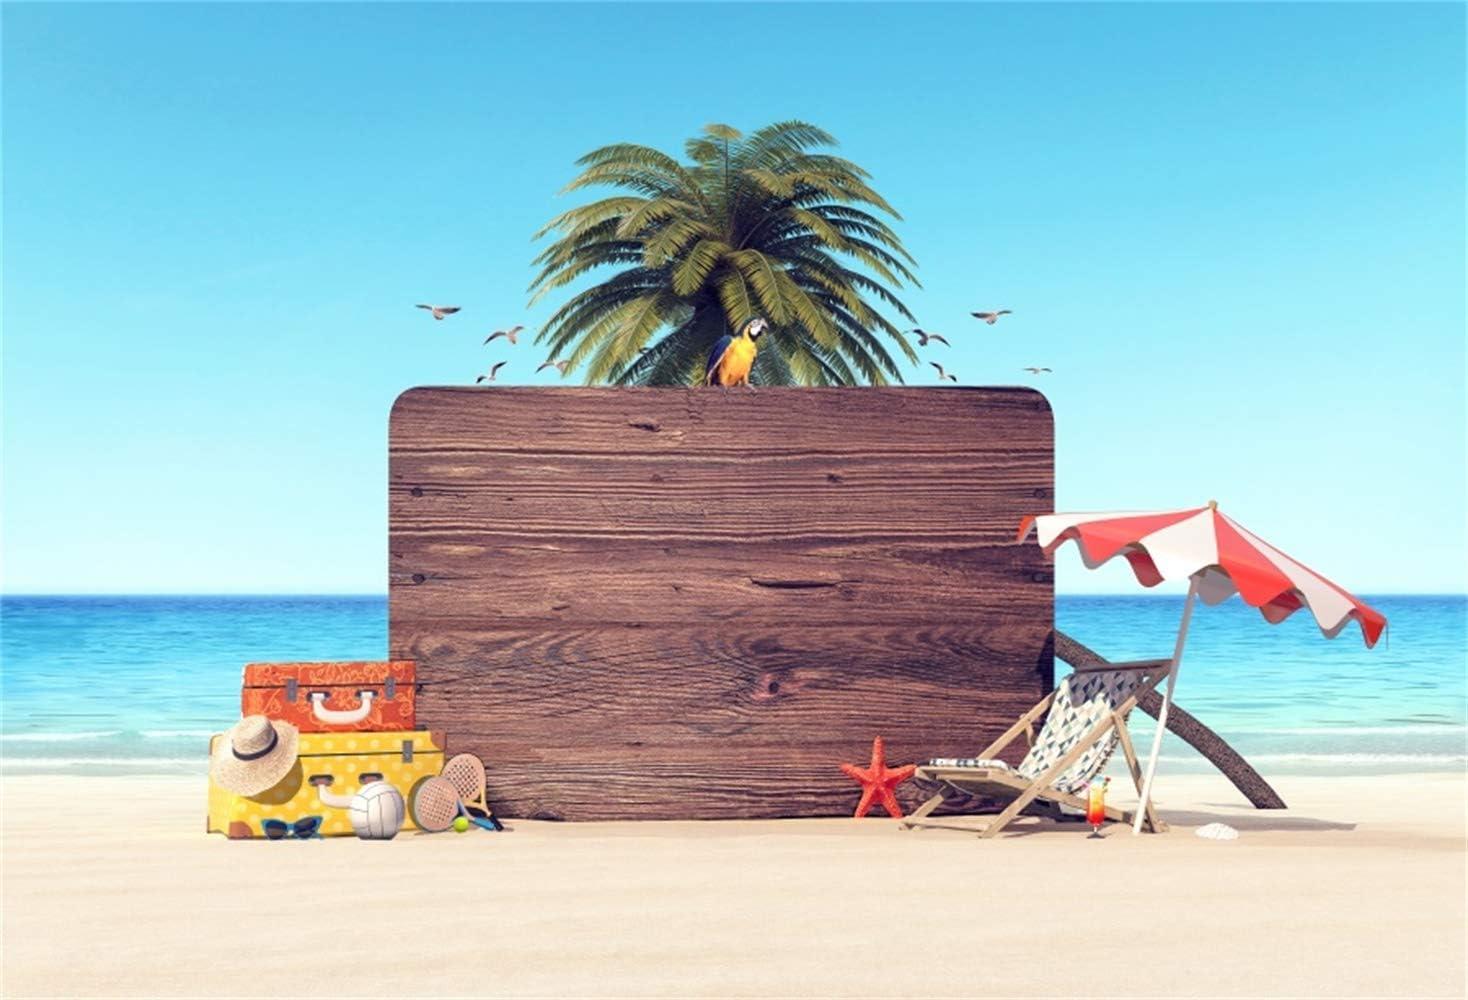 Aliyz 7x5ft Seaside Vacation Theme Fotografía Telón de Fondo Azul Mar Agua Palmera Sol Playa de Arena Maleta Fondo para Viajes Bebé Adultos Retratos Pantalla de Video Photo Booth Prop